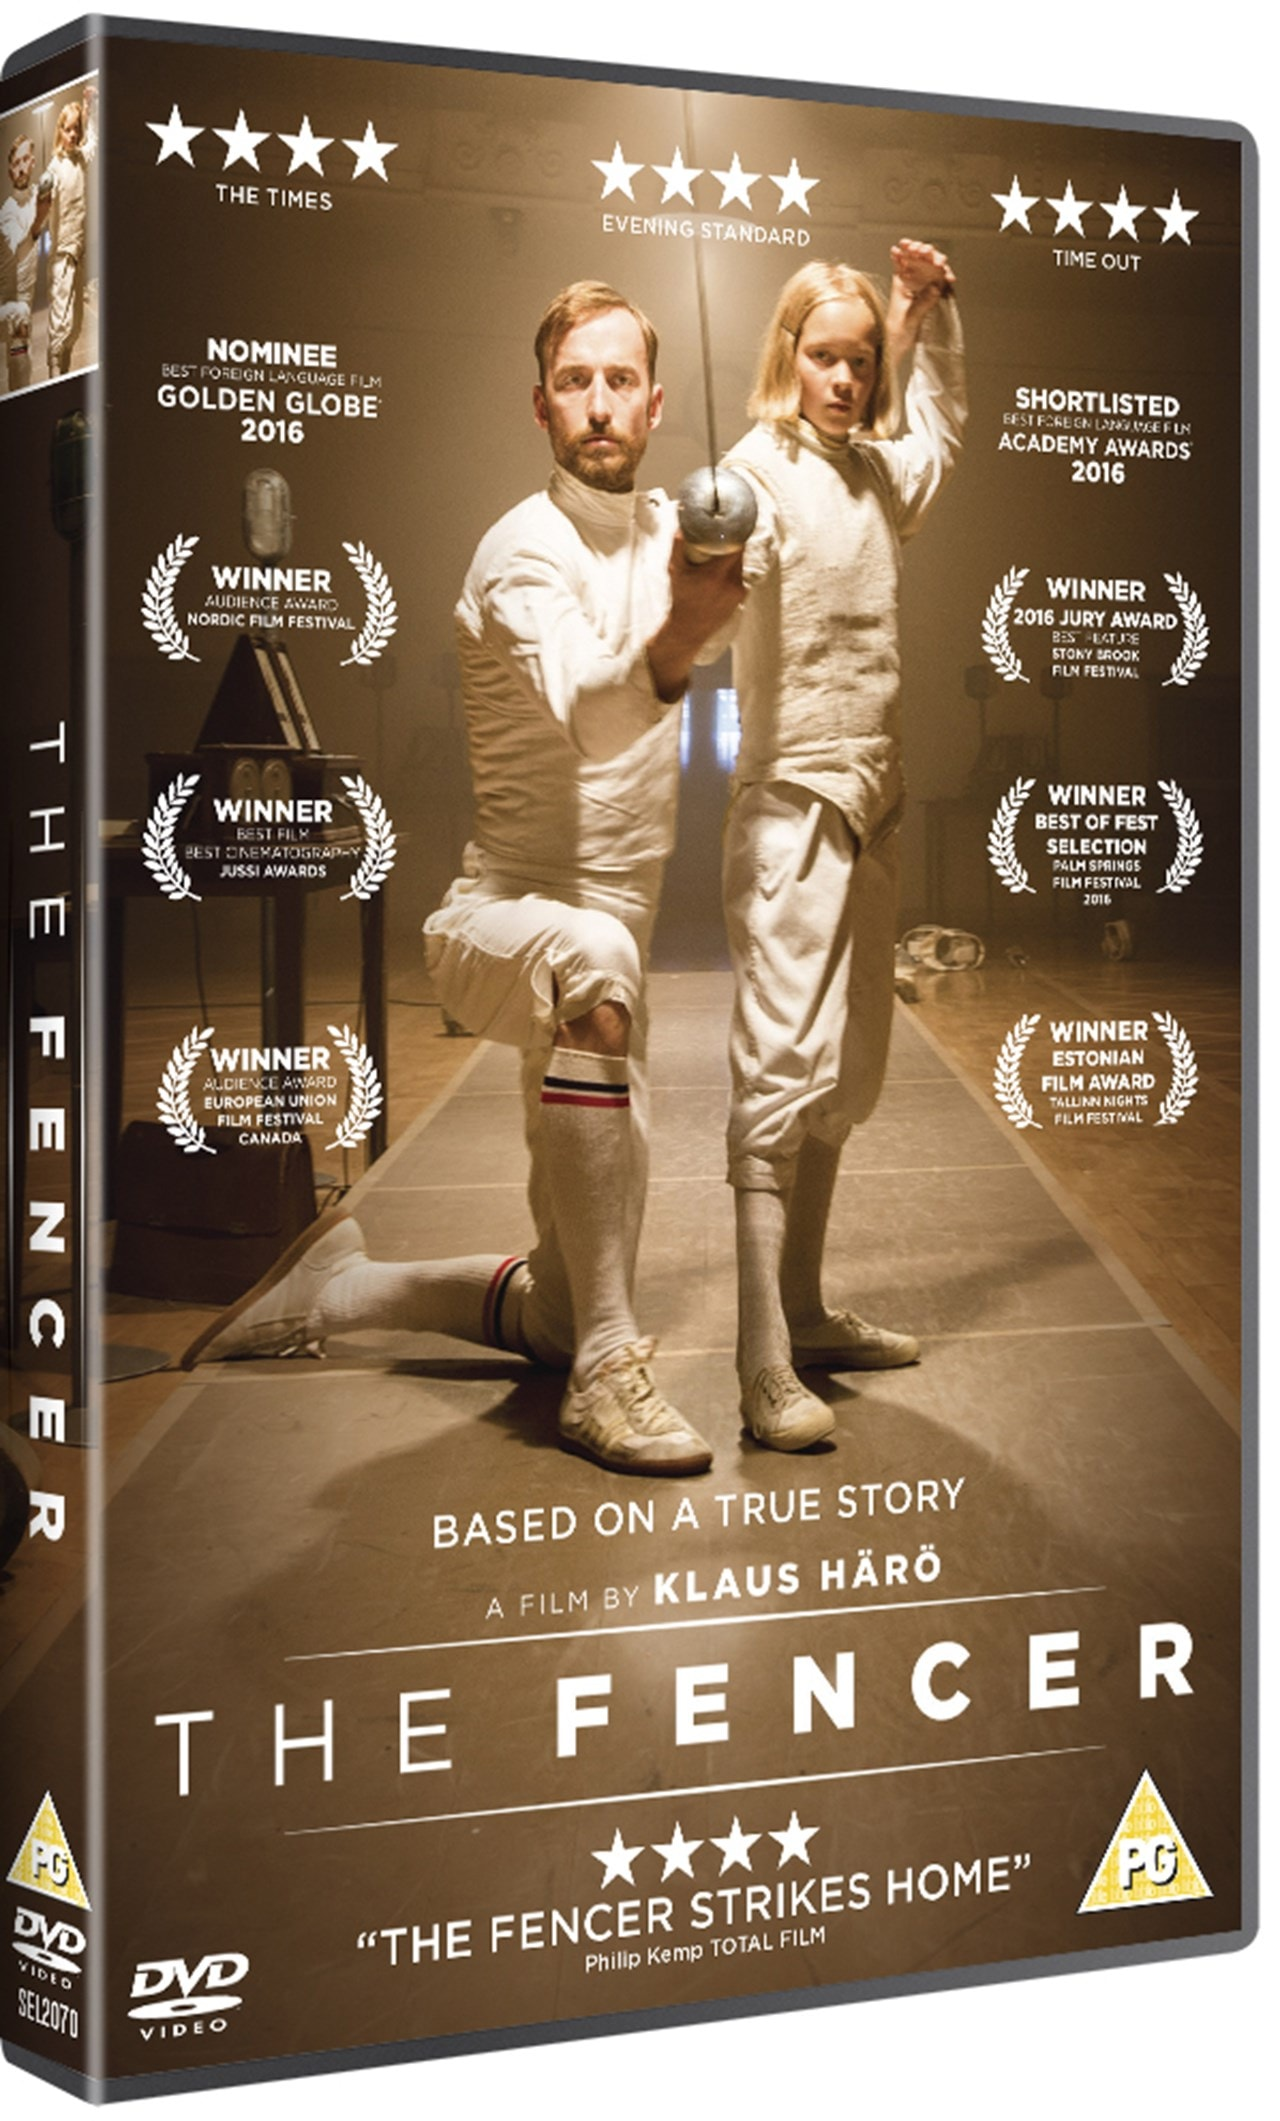 The Fencer - 2